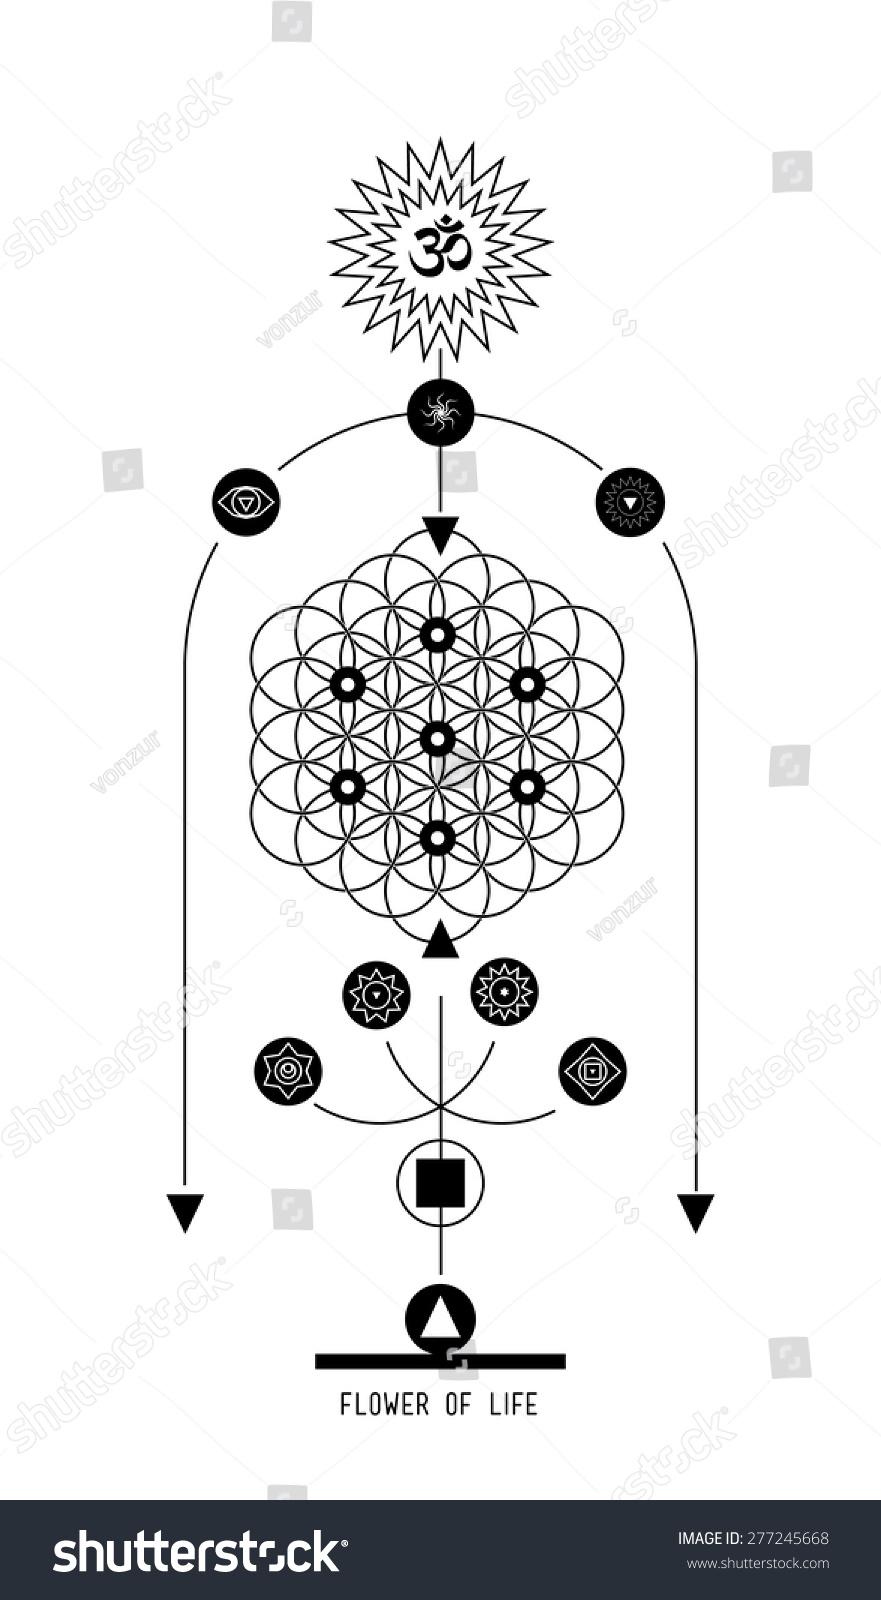 Flower life buddhist hindu tantric symbol stock vector 277245668 flower of life buddhist hindu tantric symbol harmony and balance cosmos and the universe buycottarizona Gallery